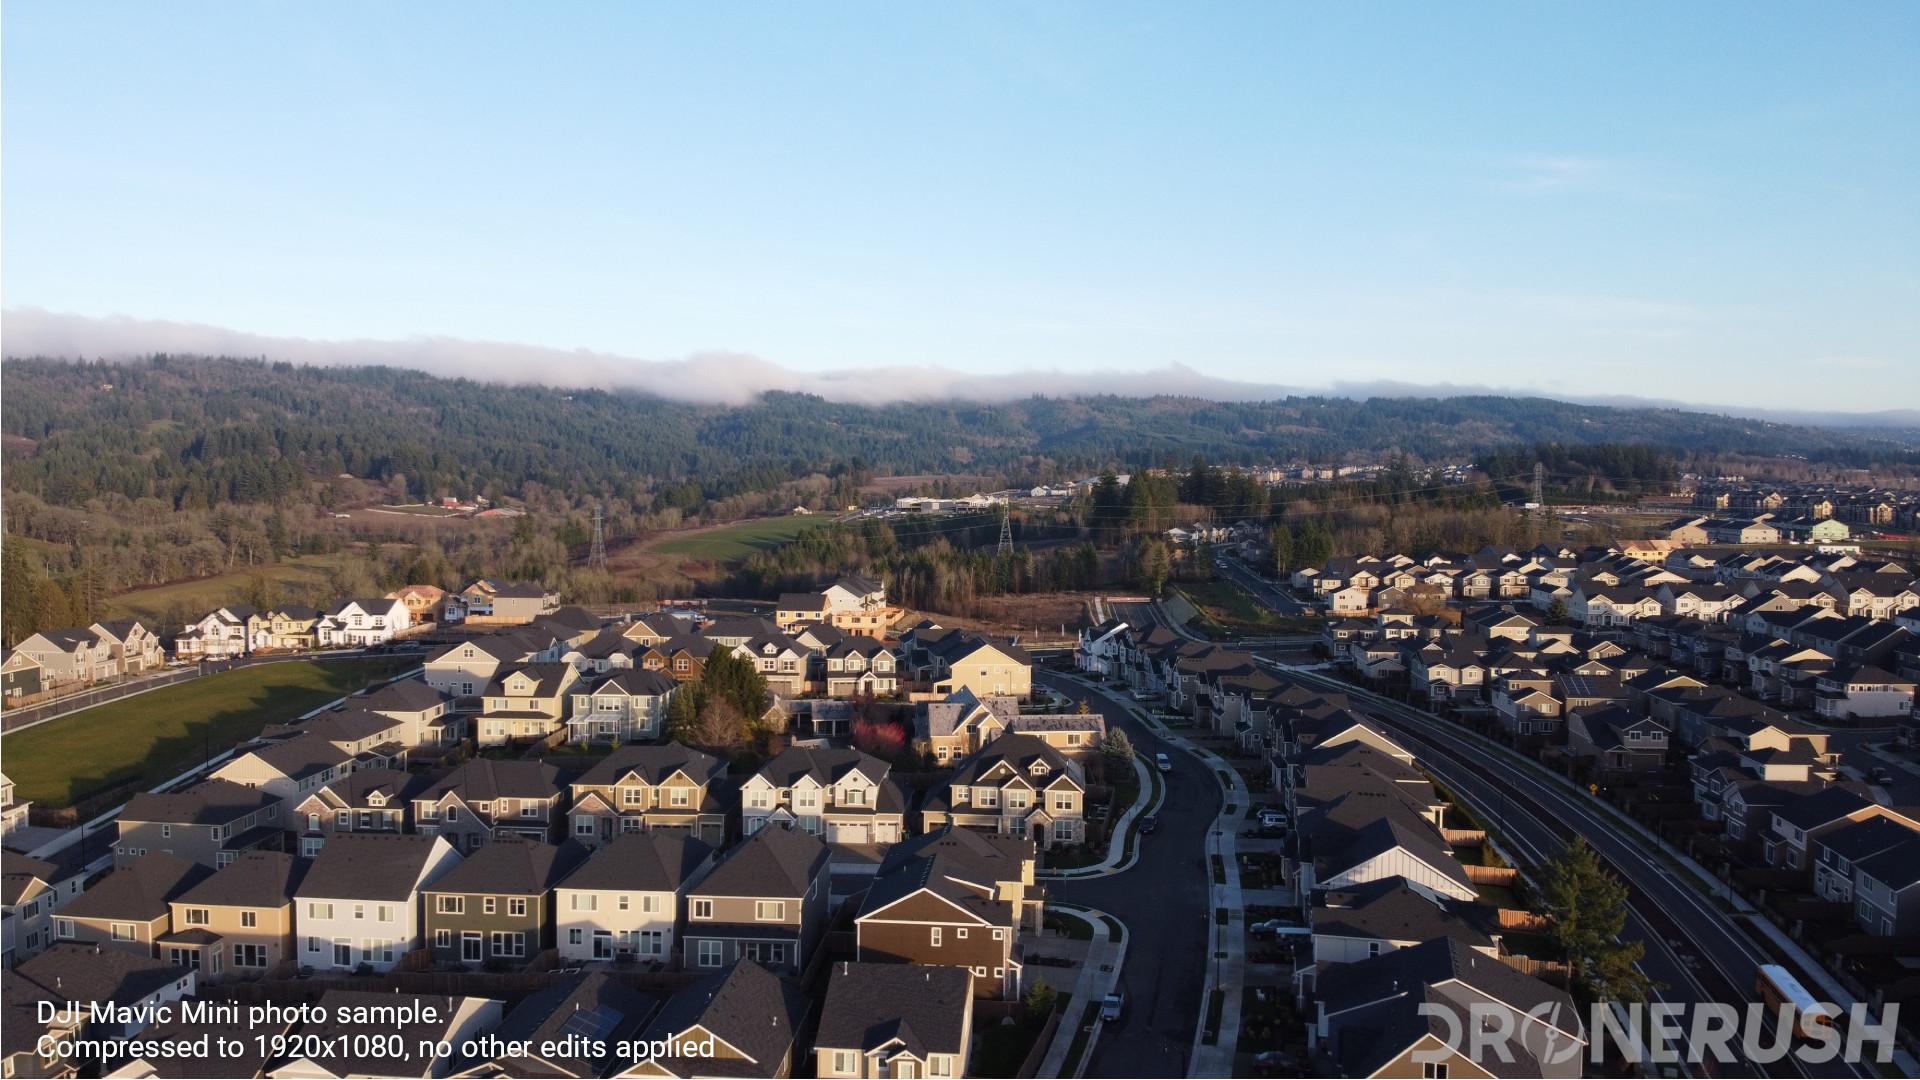 DJI Mavic Mini photo sample buildings and hills sun behind